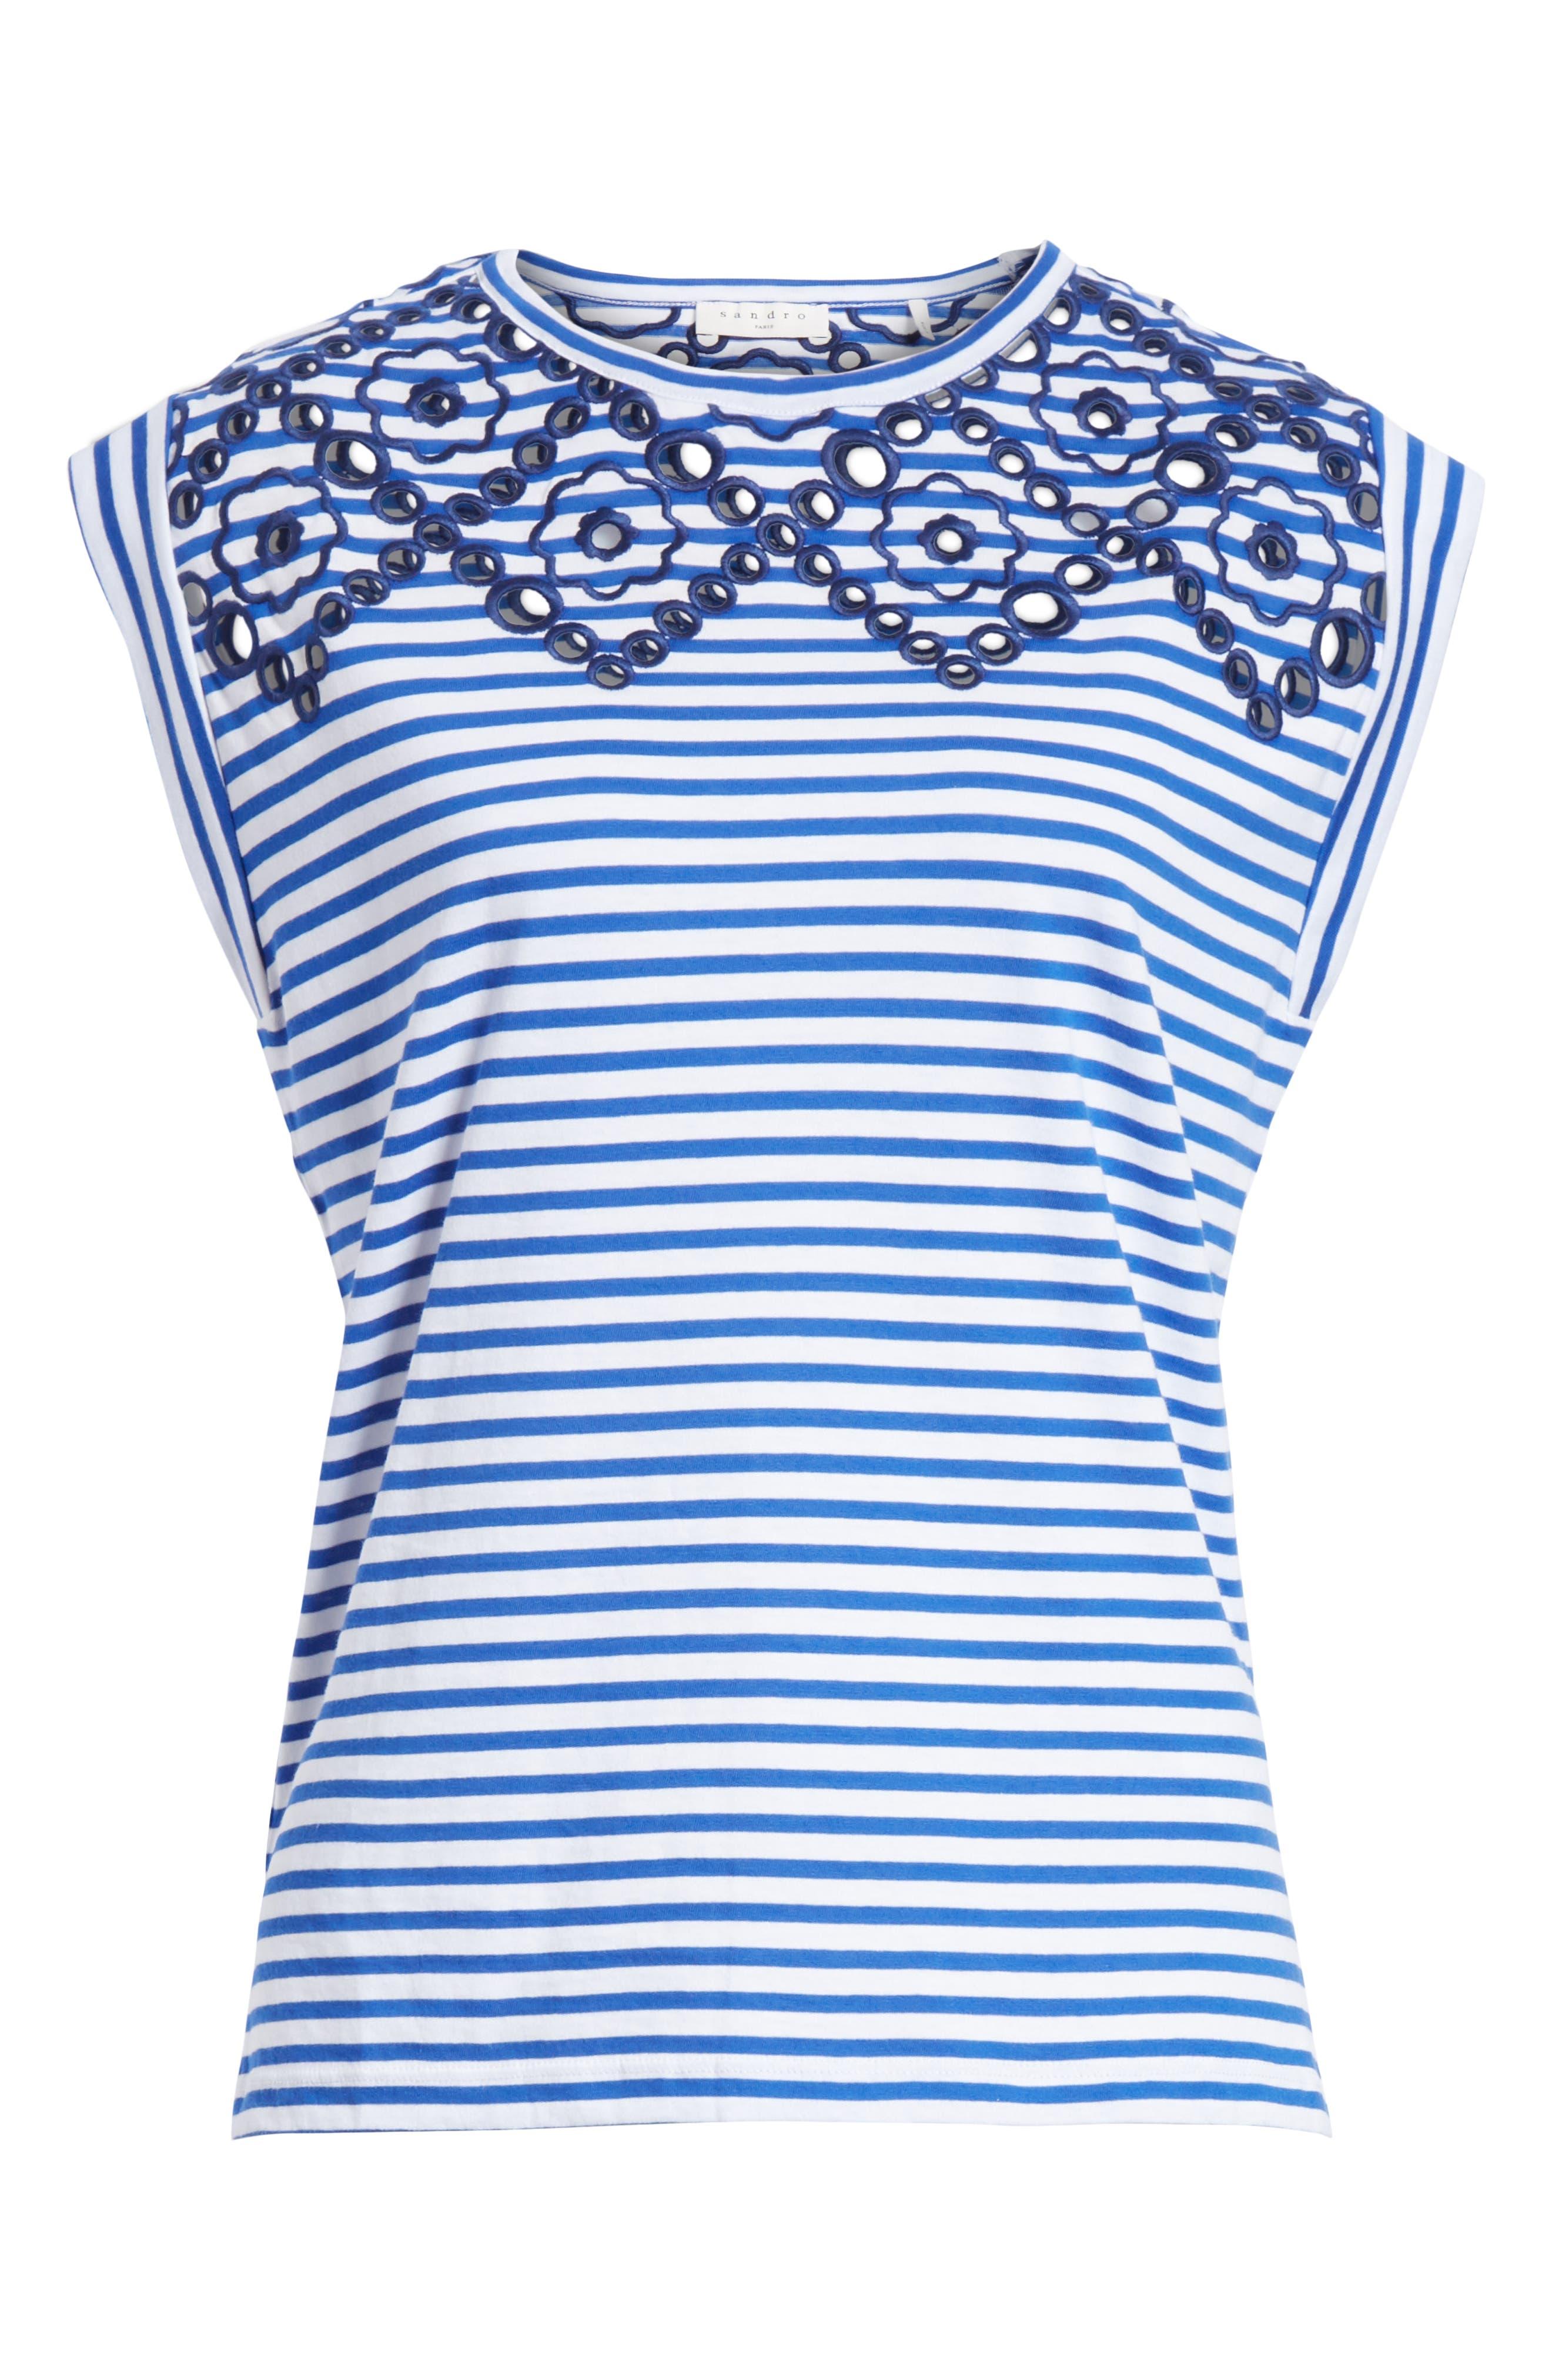 Stripe Embroidered Stencil Cotton Top,                             Alternate thumbnail 6, color,                             Bleu Nuit